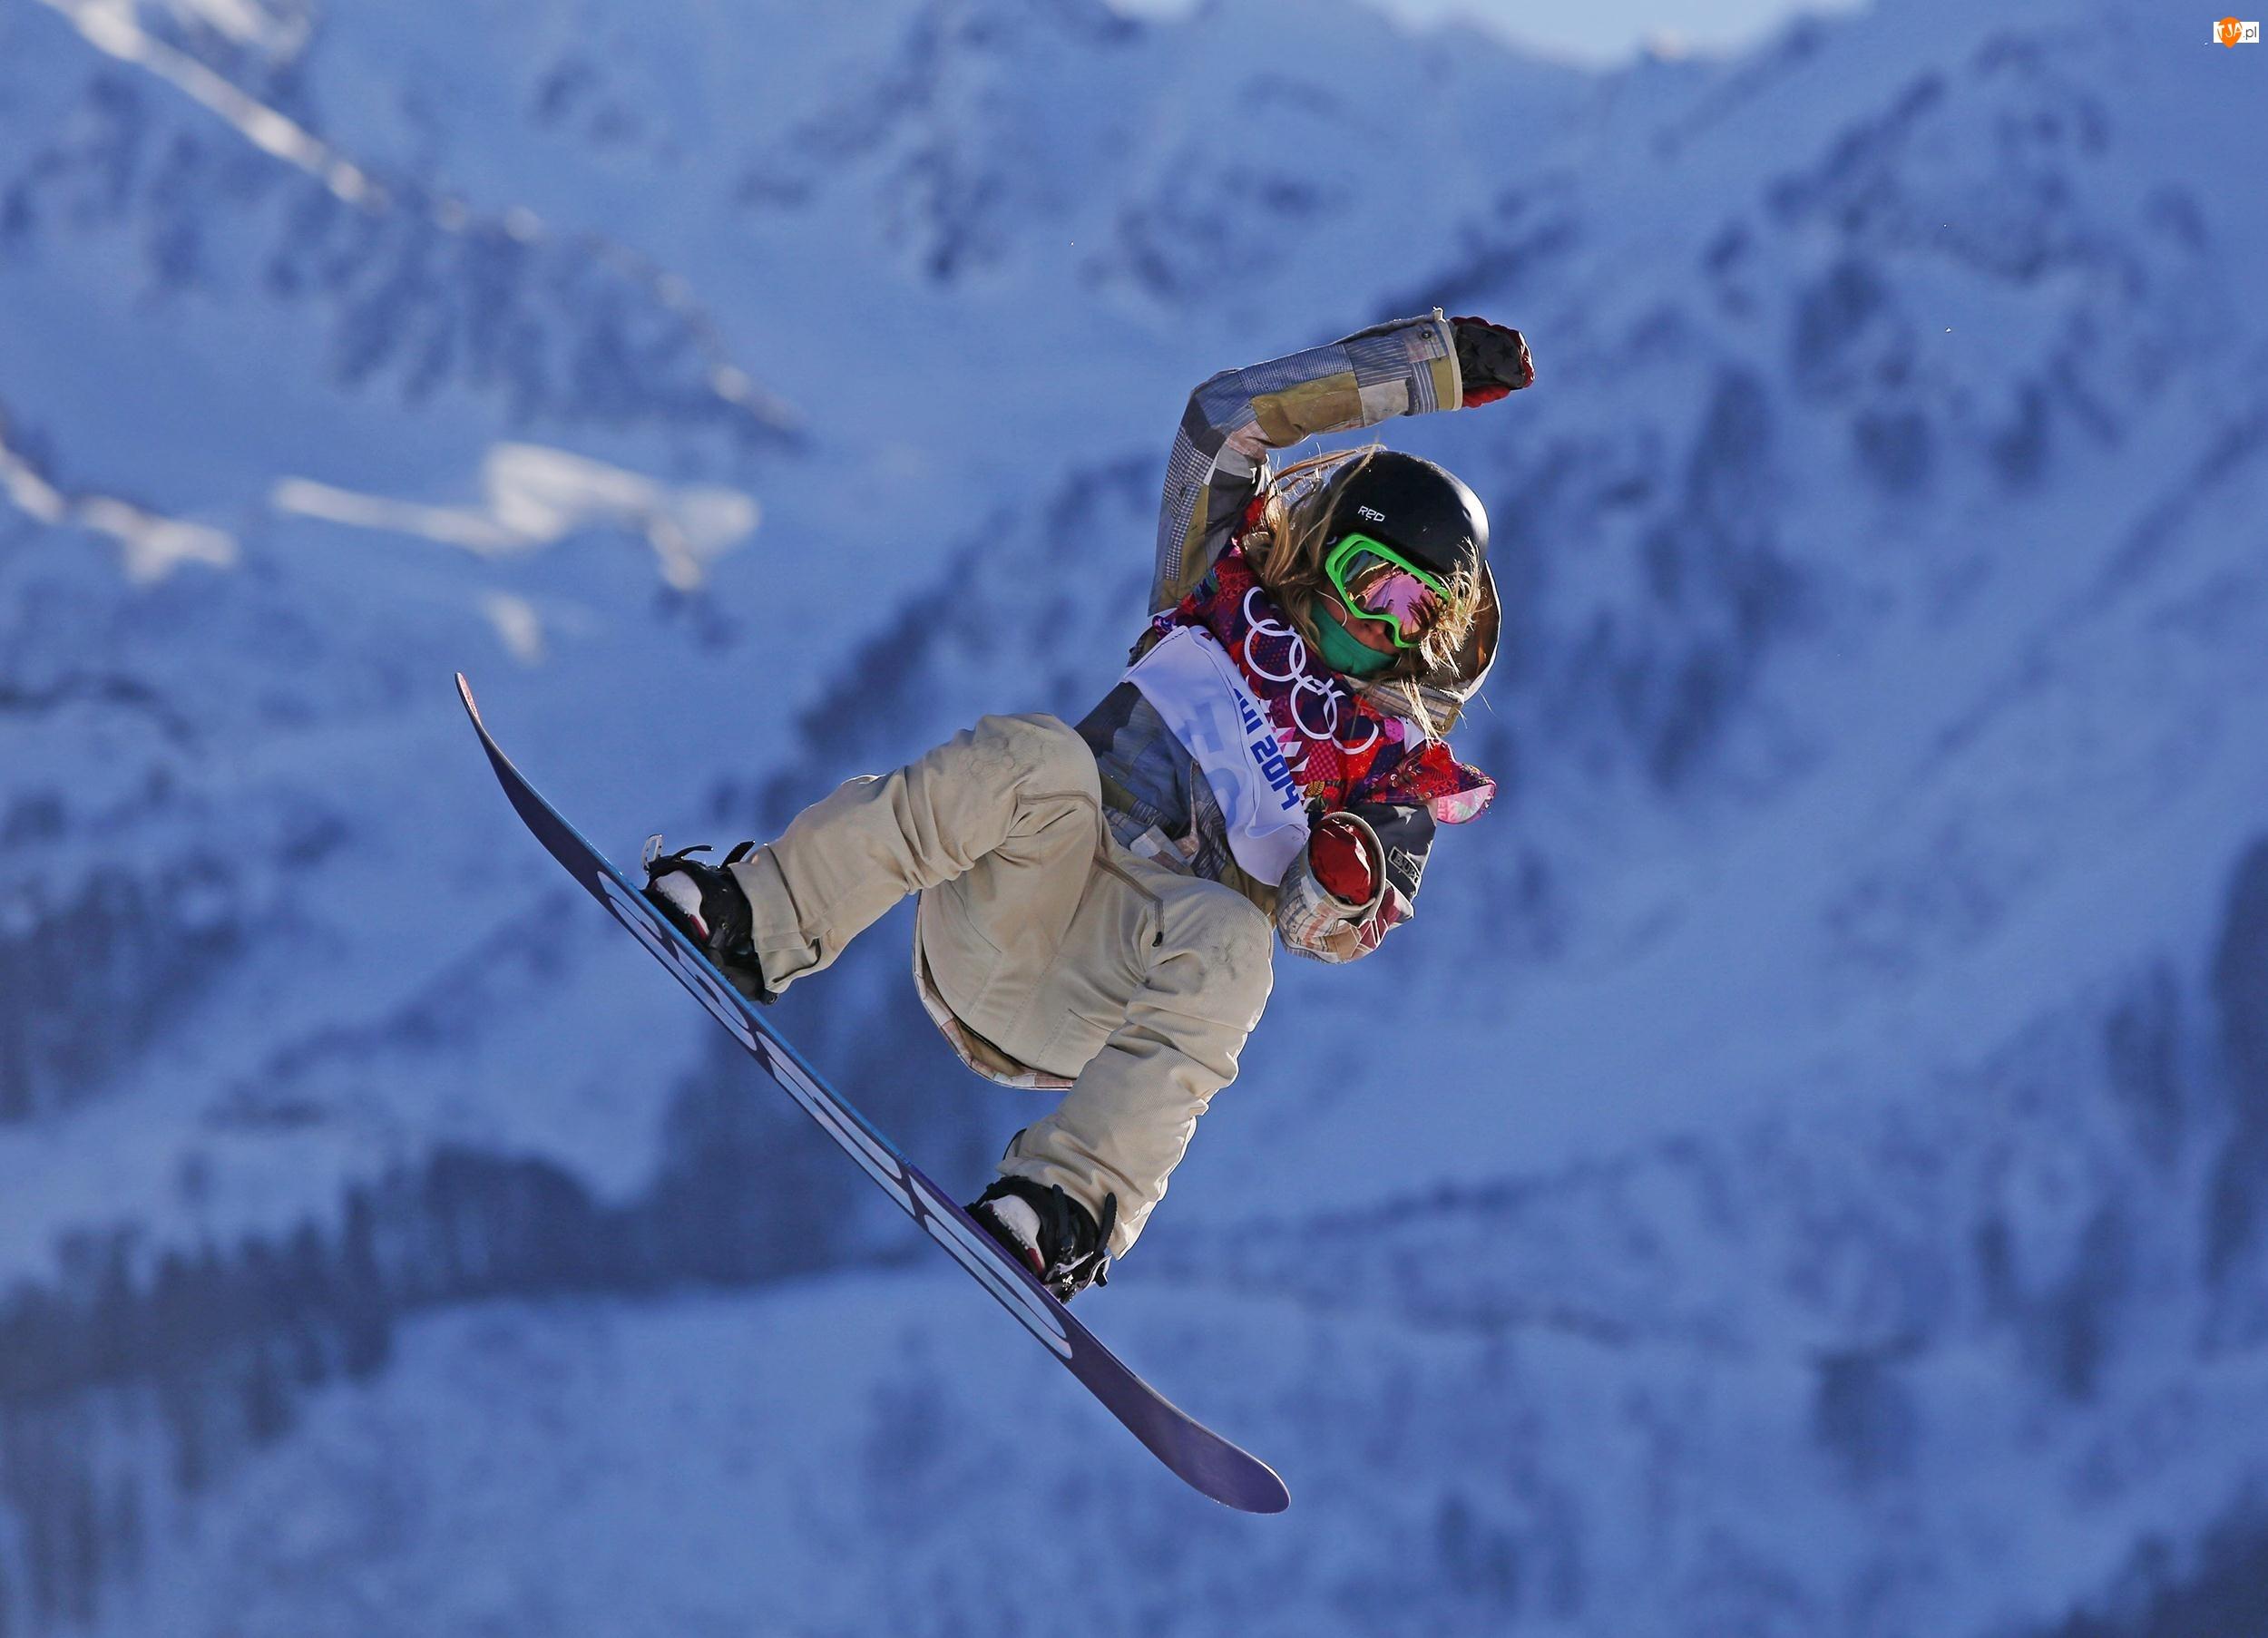 Olimpiada, Złoty, Jamie Anderson, Snowbording, Sochi, Slopestyle, Medalista